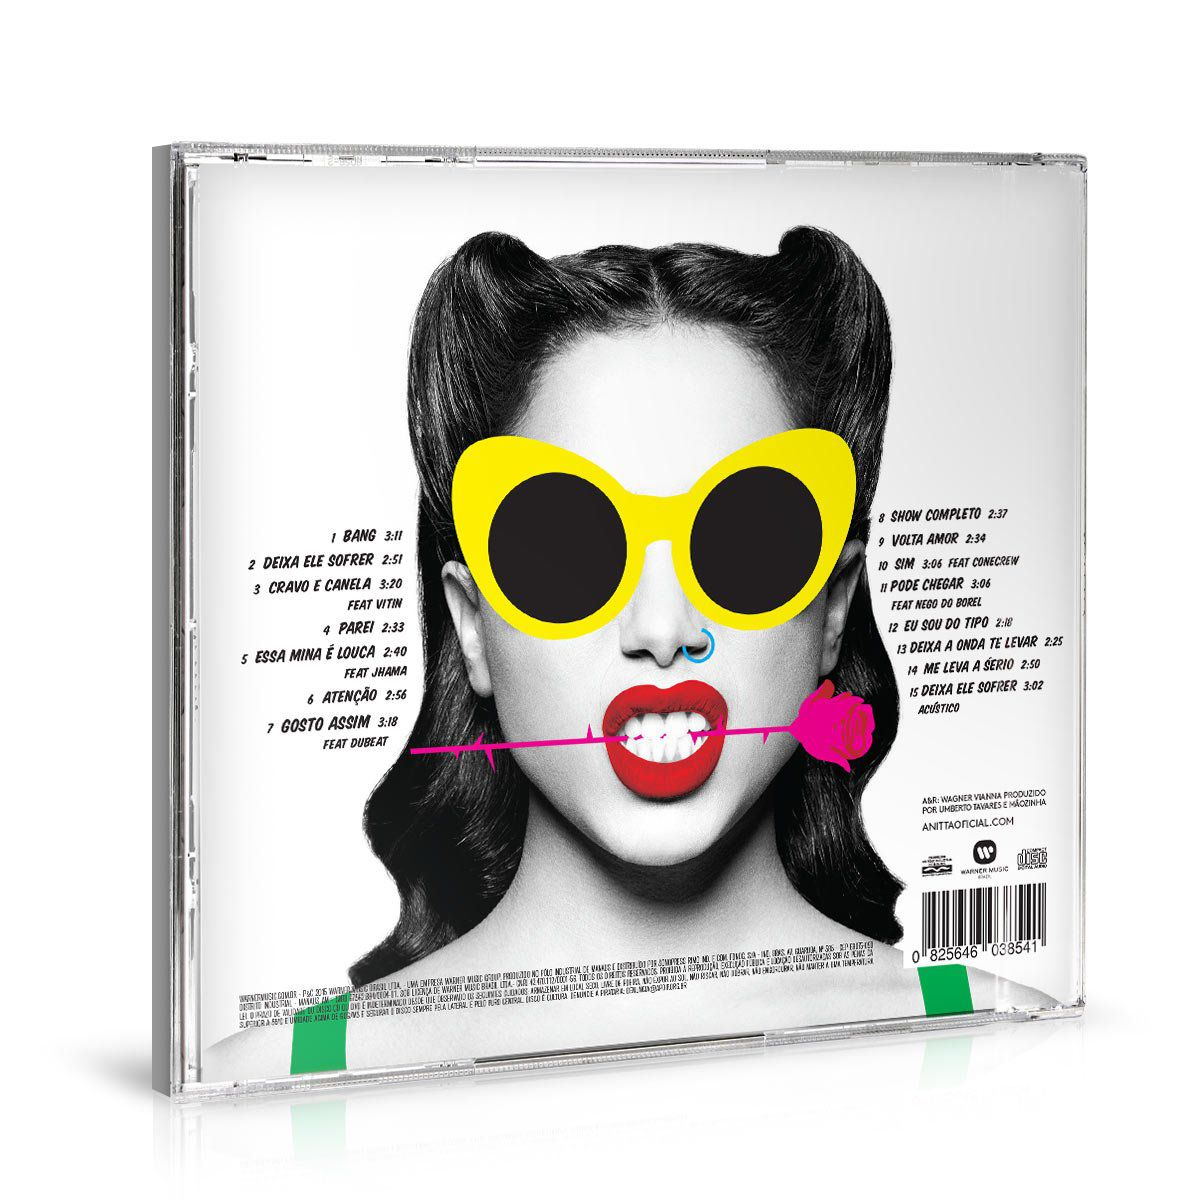 CD AUTOGRAFADO Anitta Bang!  - bandUP Store Marketplace